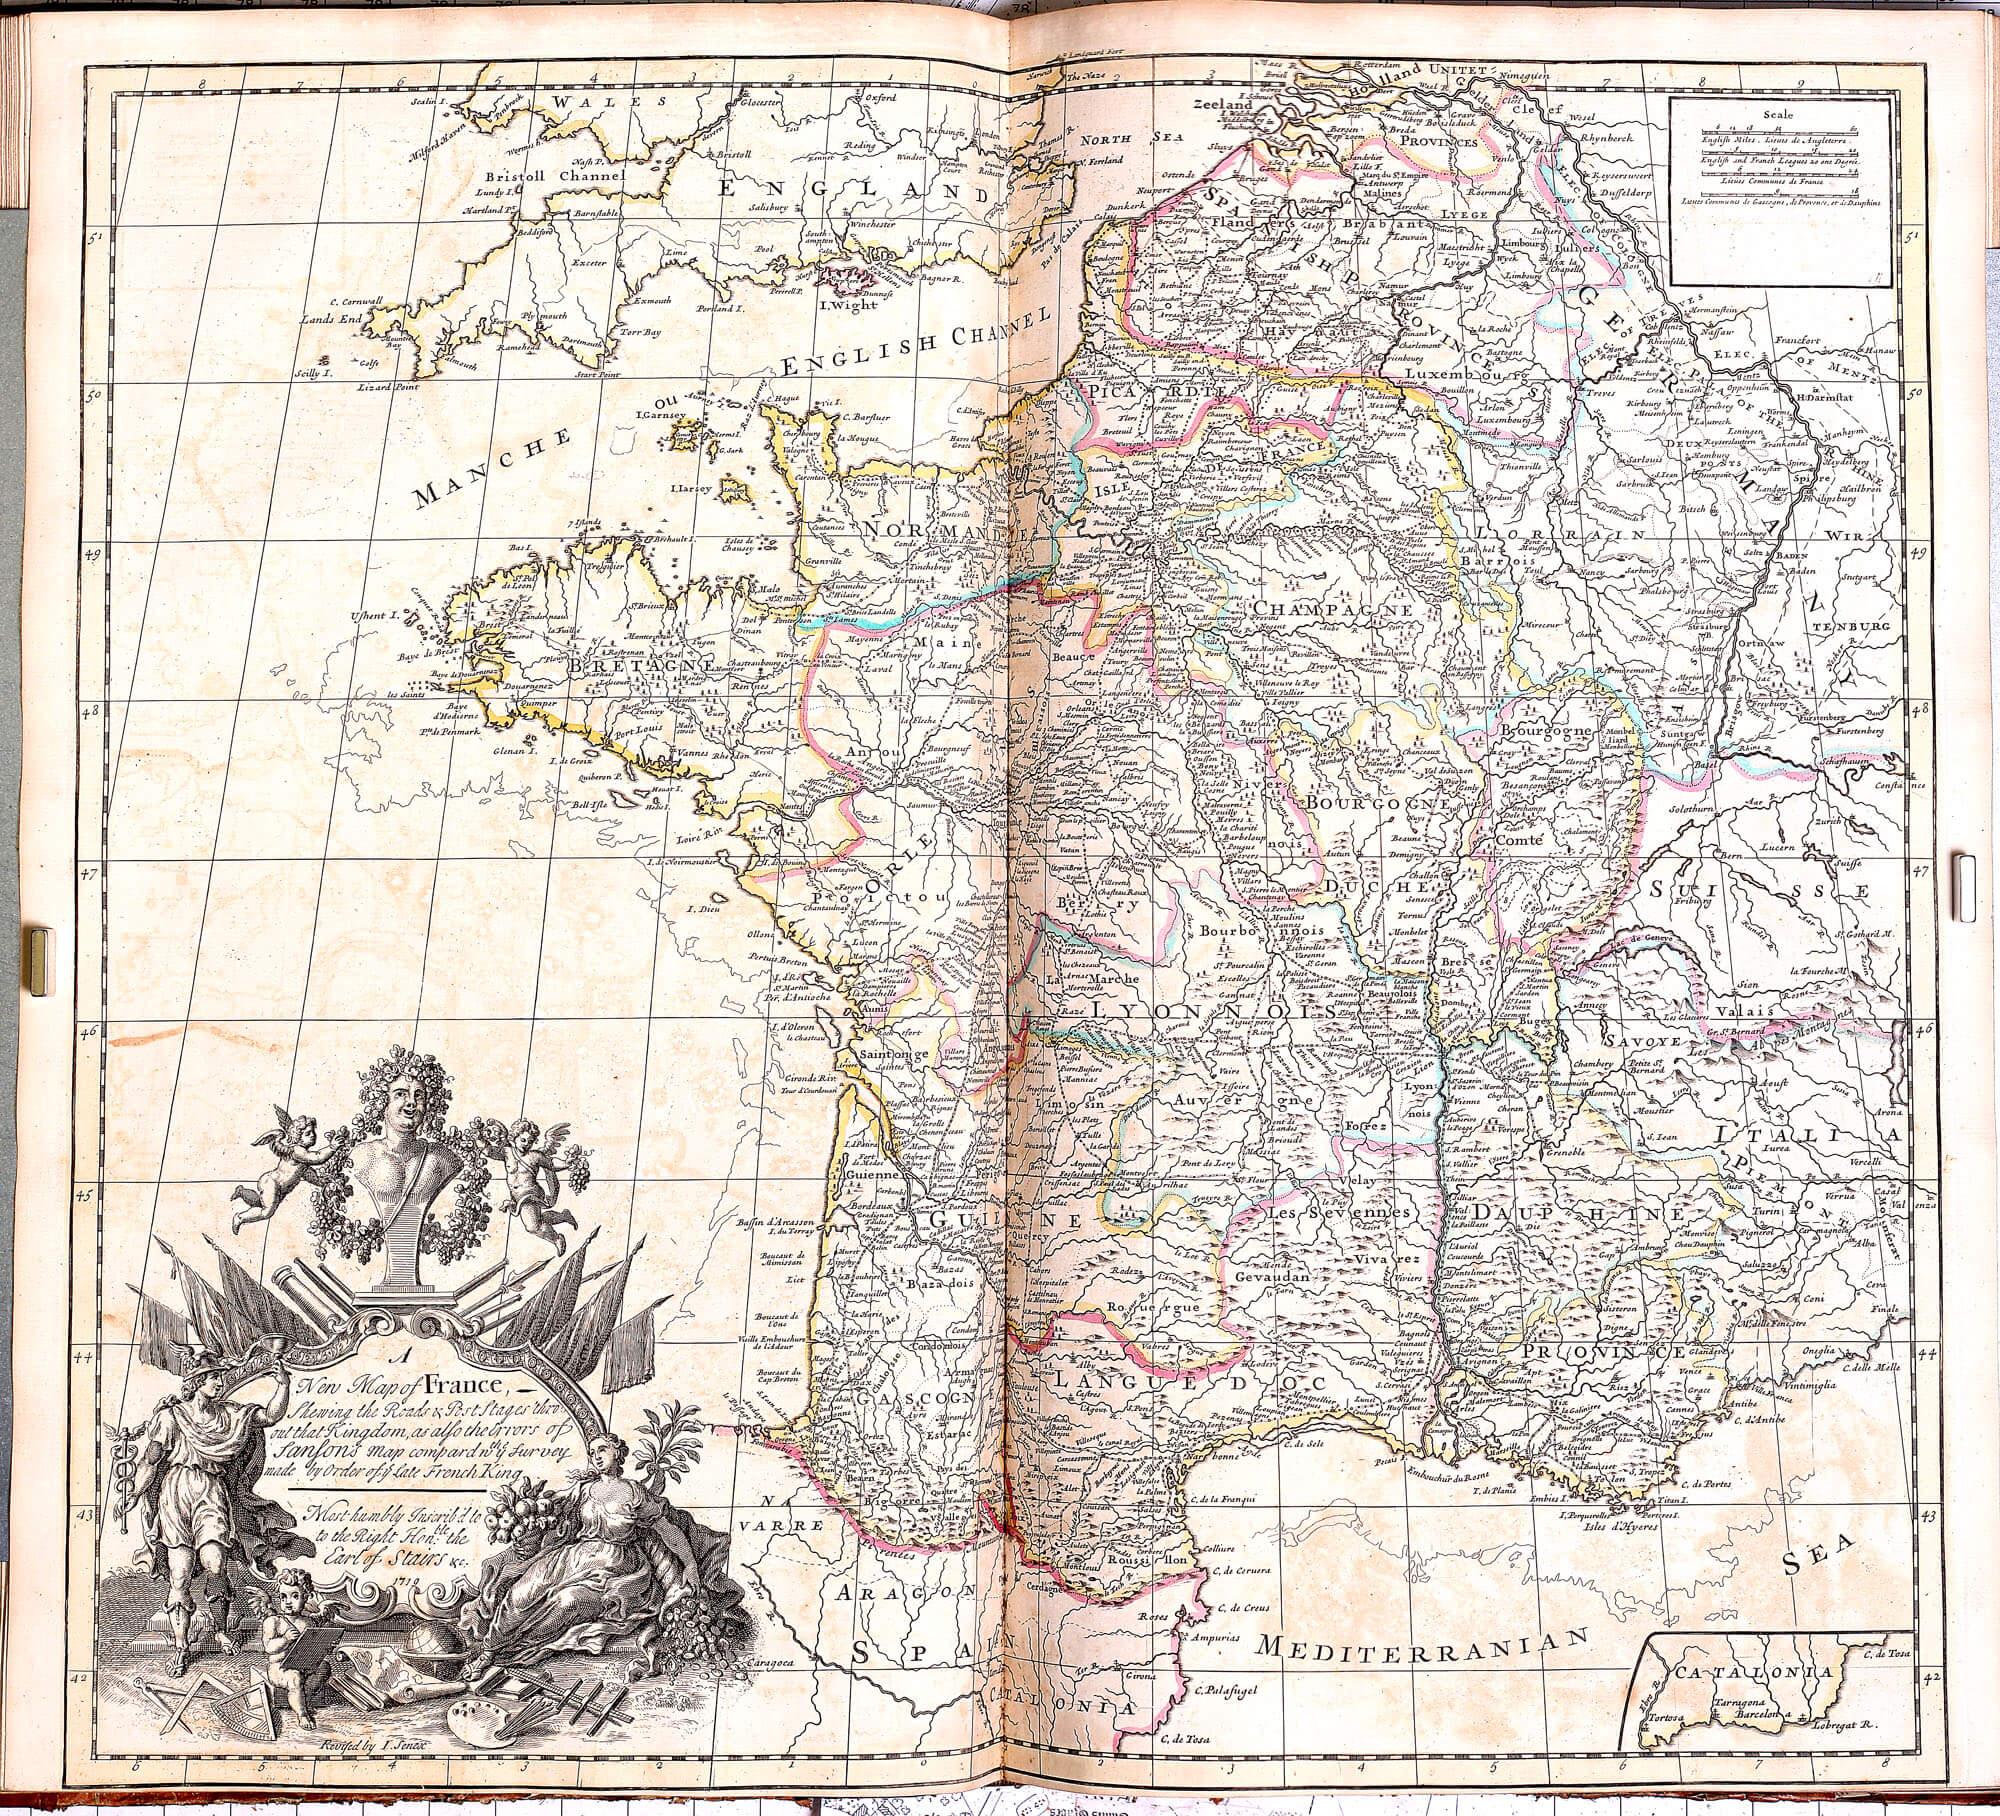 World atlas john senex 1721 l brown collection pp a 15 11 france post routes gumiabroncs Choice Image